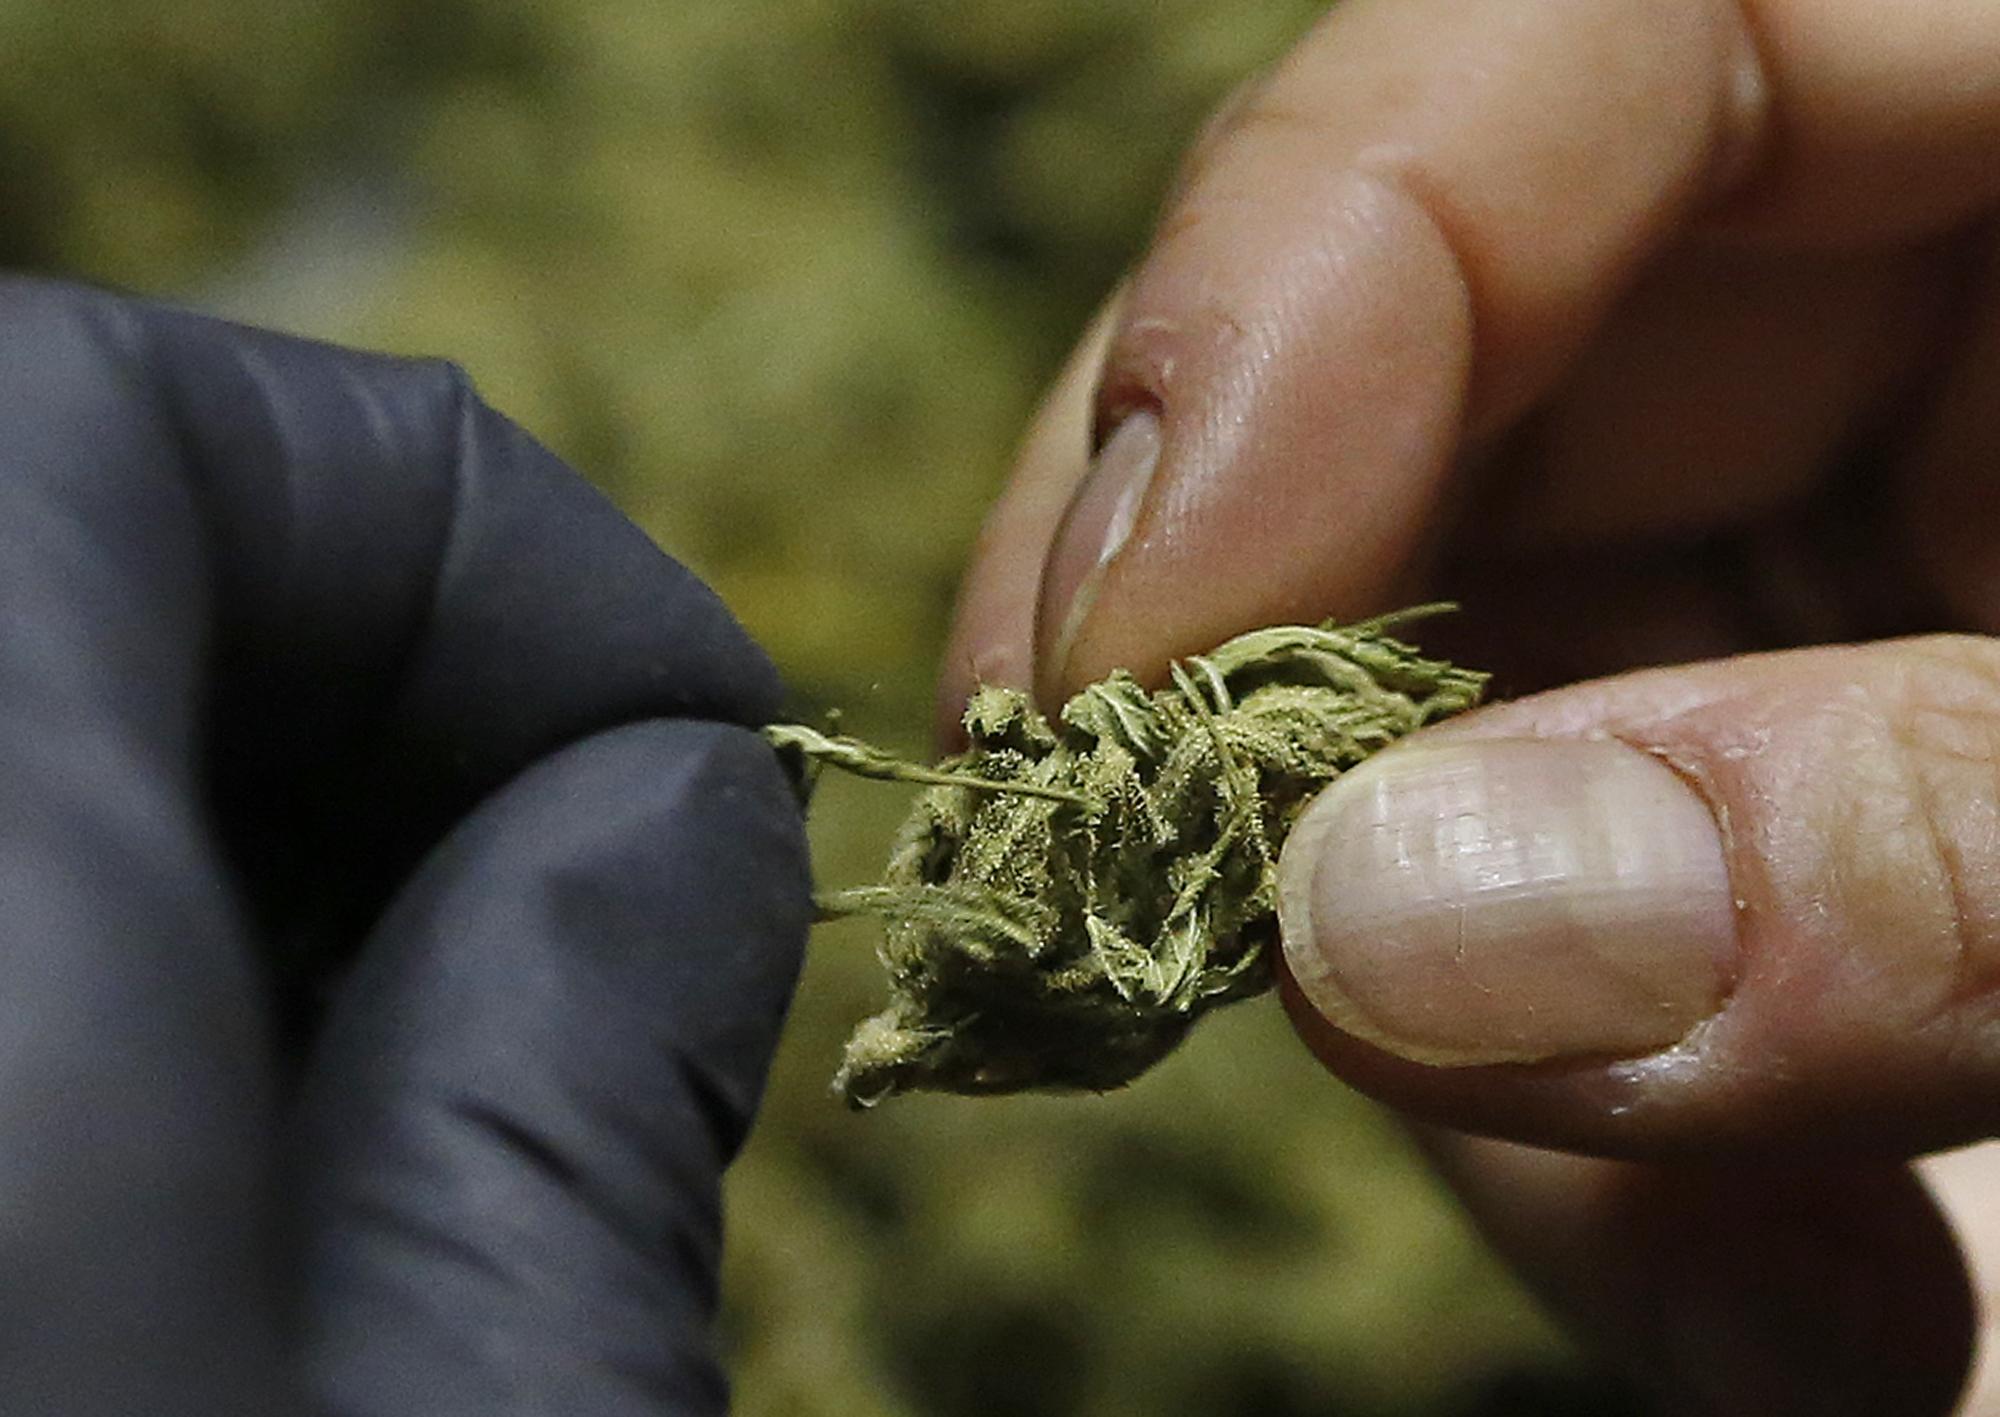 Legislature Asked To Clarify Patchwork Of Marijuana Laws